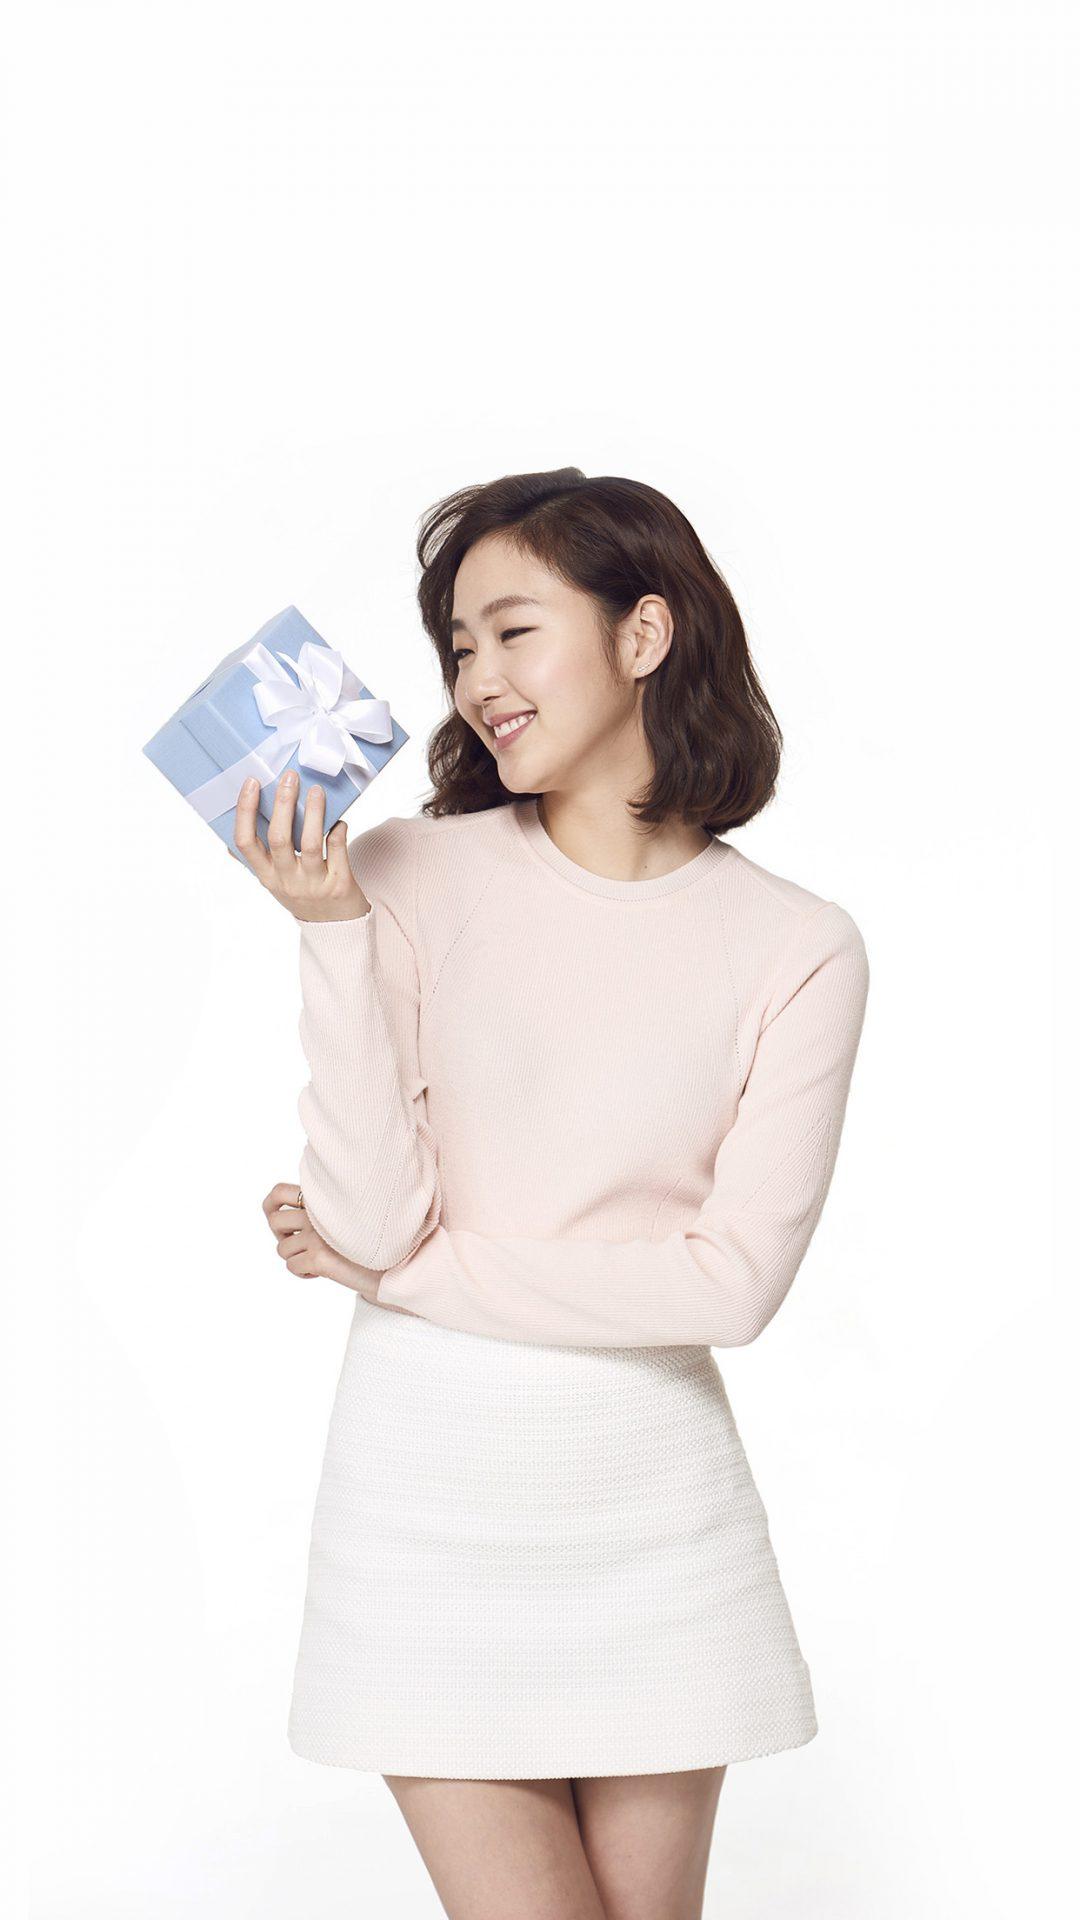 Kpop Goeun Gift Photo Celebrity Cute Smile